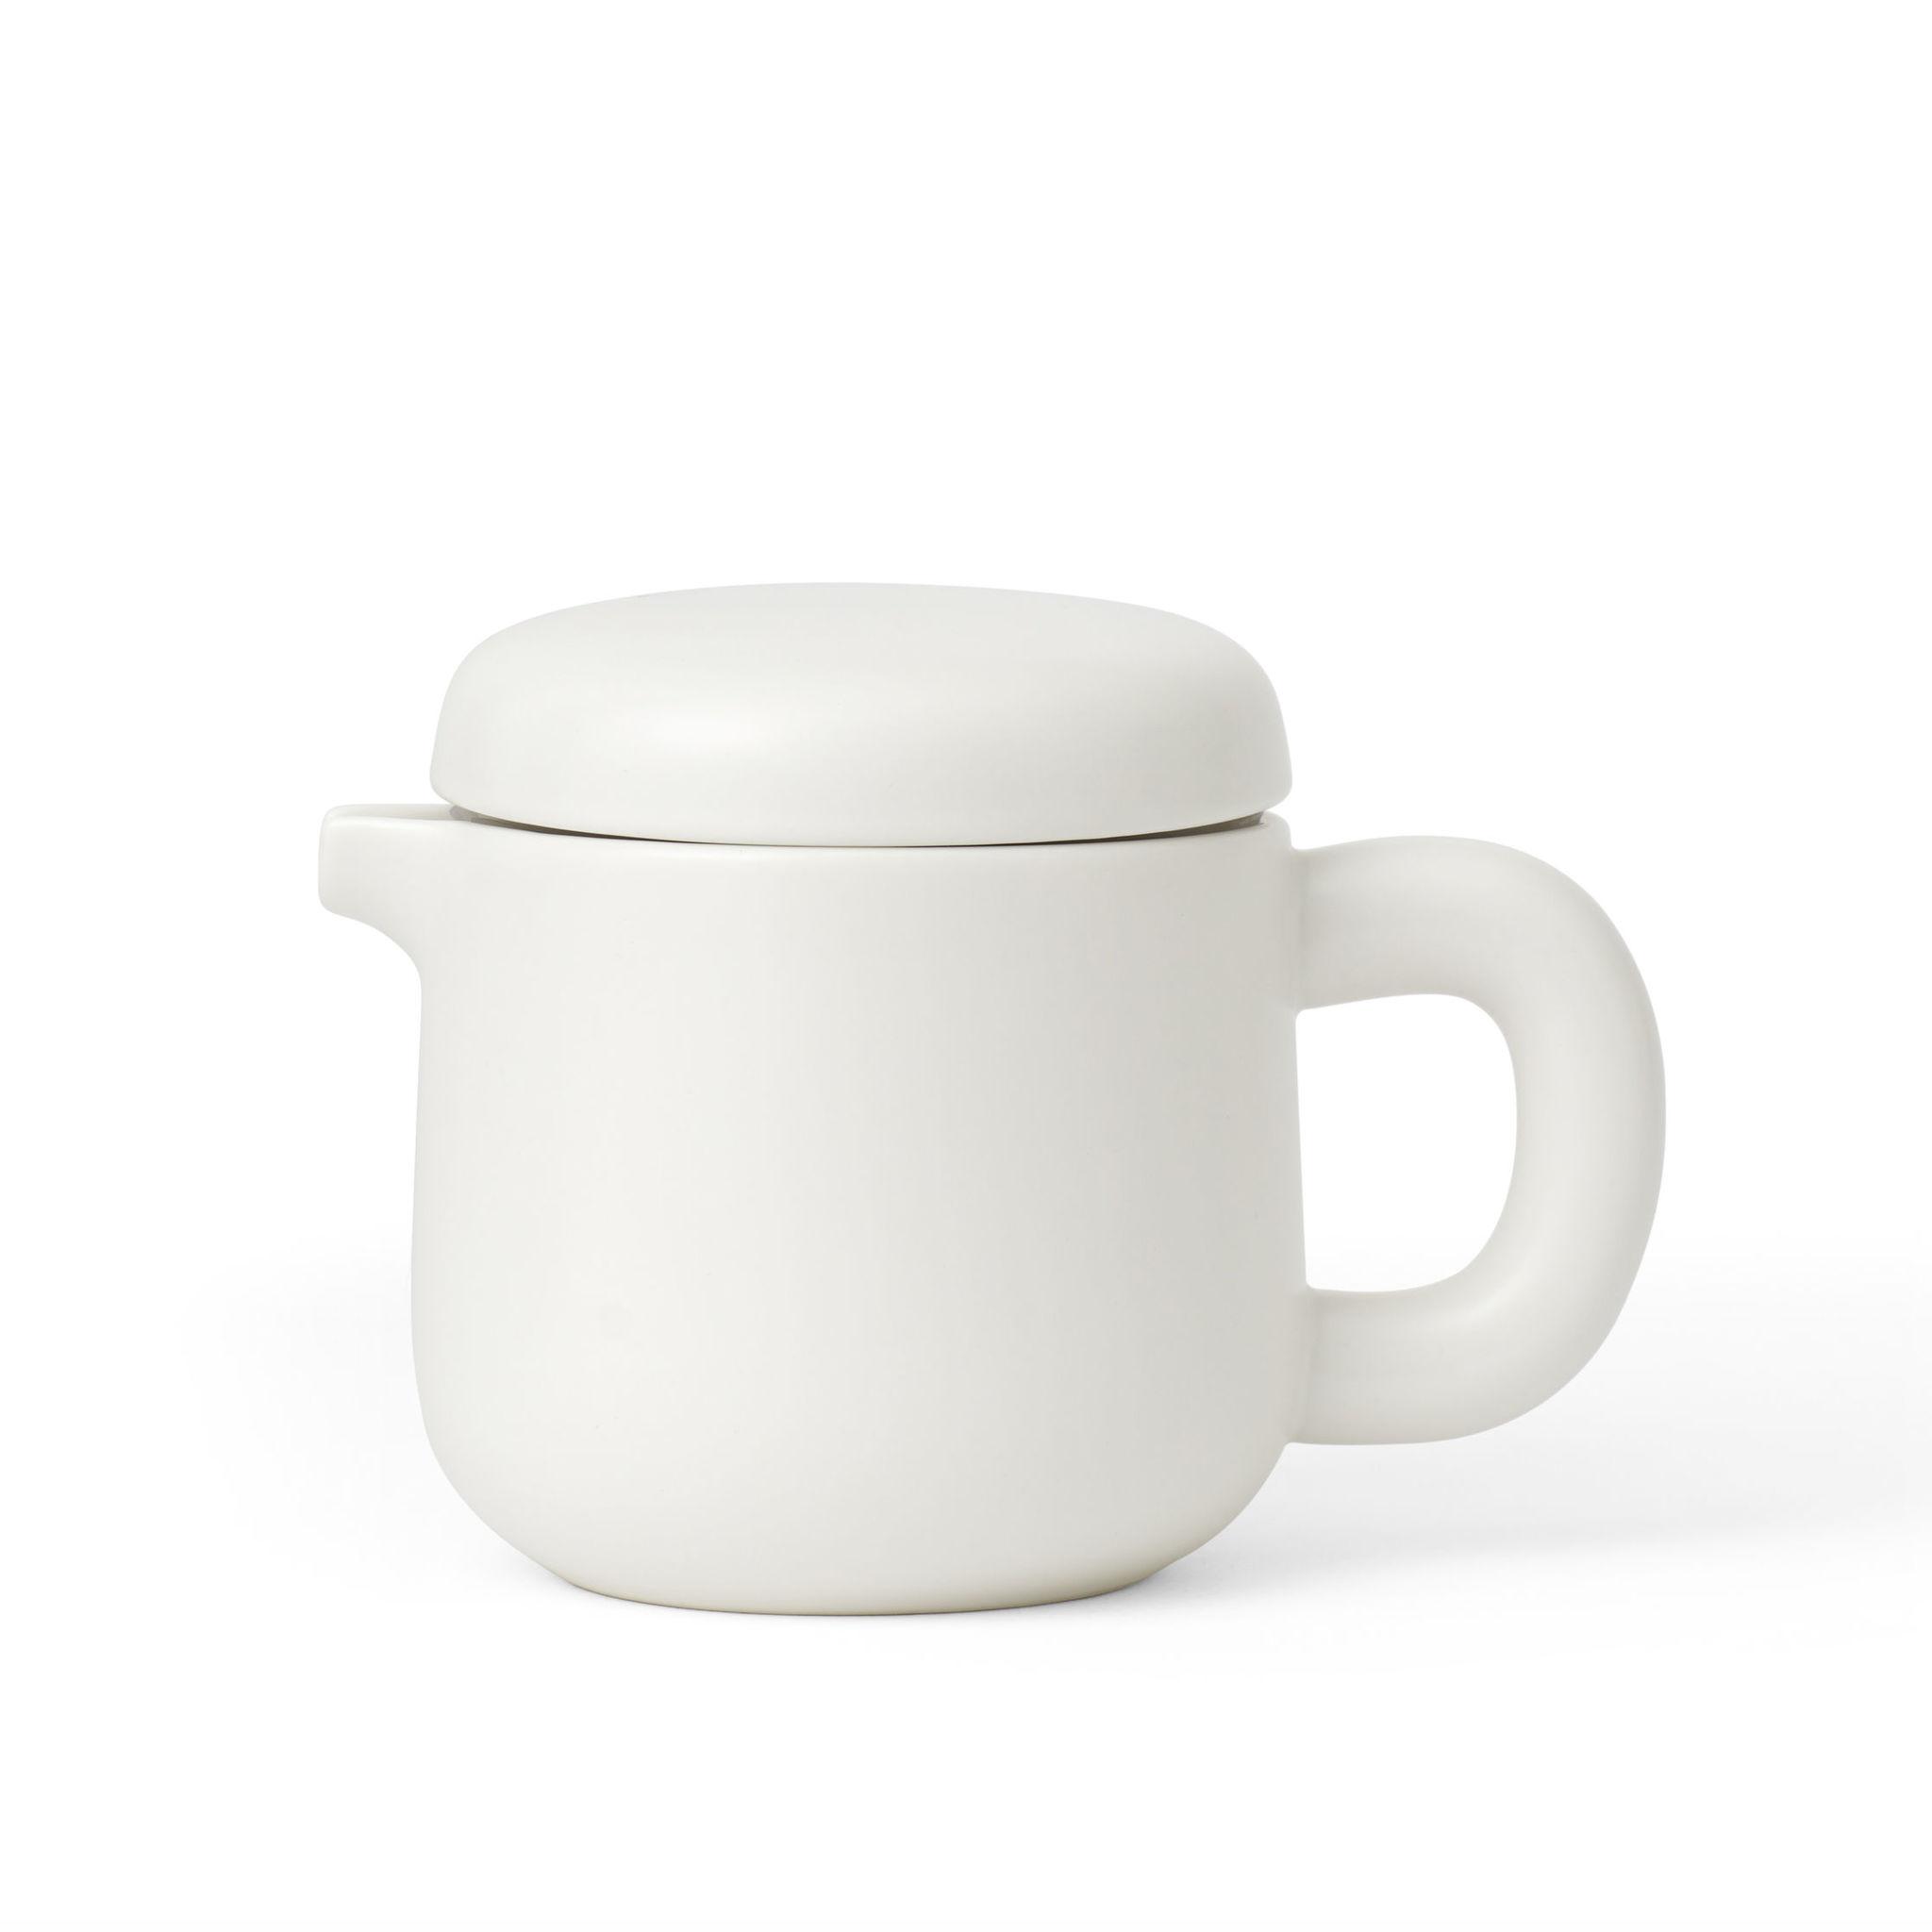 "Чайник заварочный с ситечком Viva Scandinavia ""Isabella"" 600 мл"